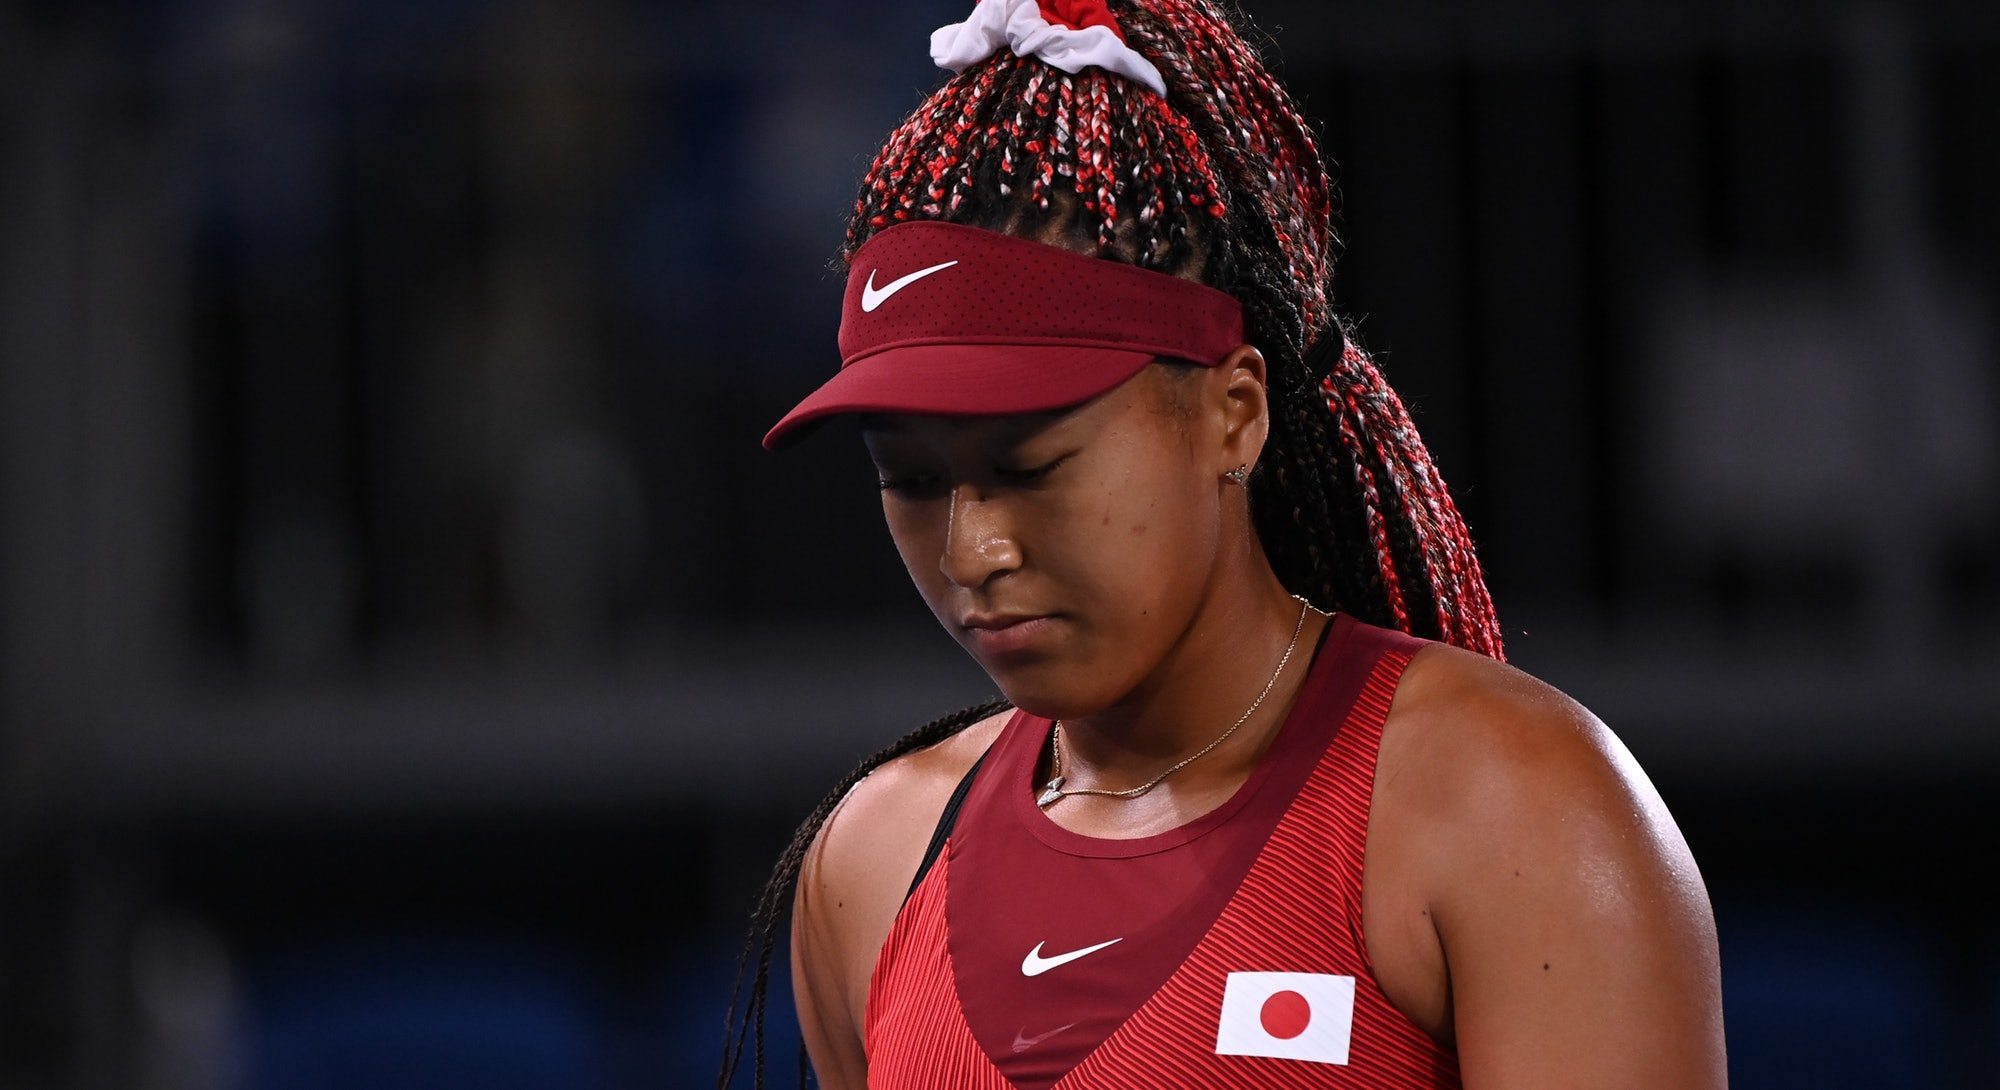 Naomi Osaka's box braids, Suni Lee's eyelash extensions, and Simone Biles' soft glam  were some of t...